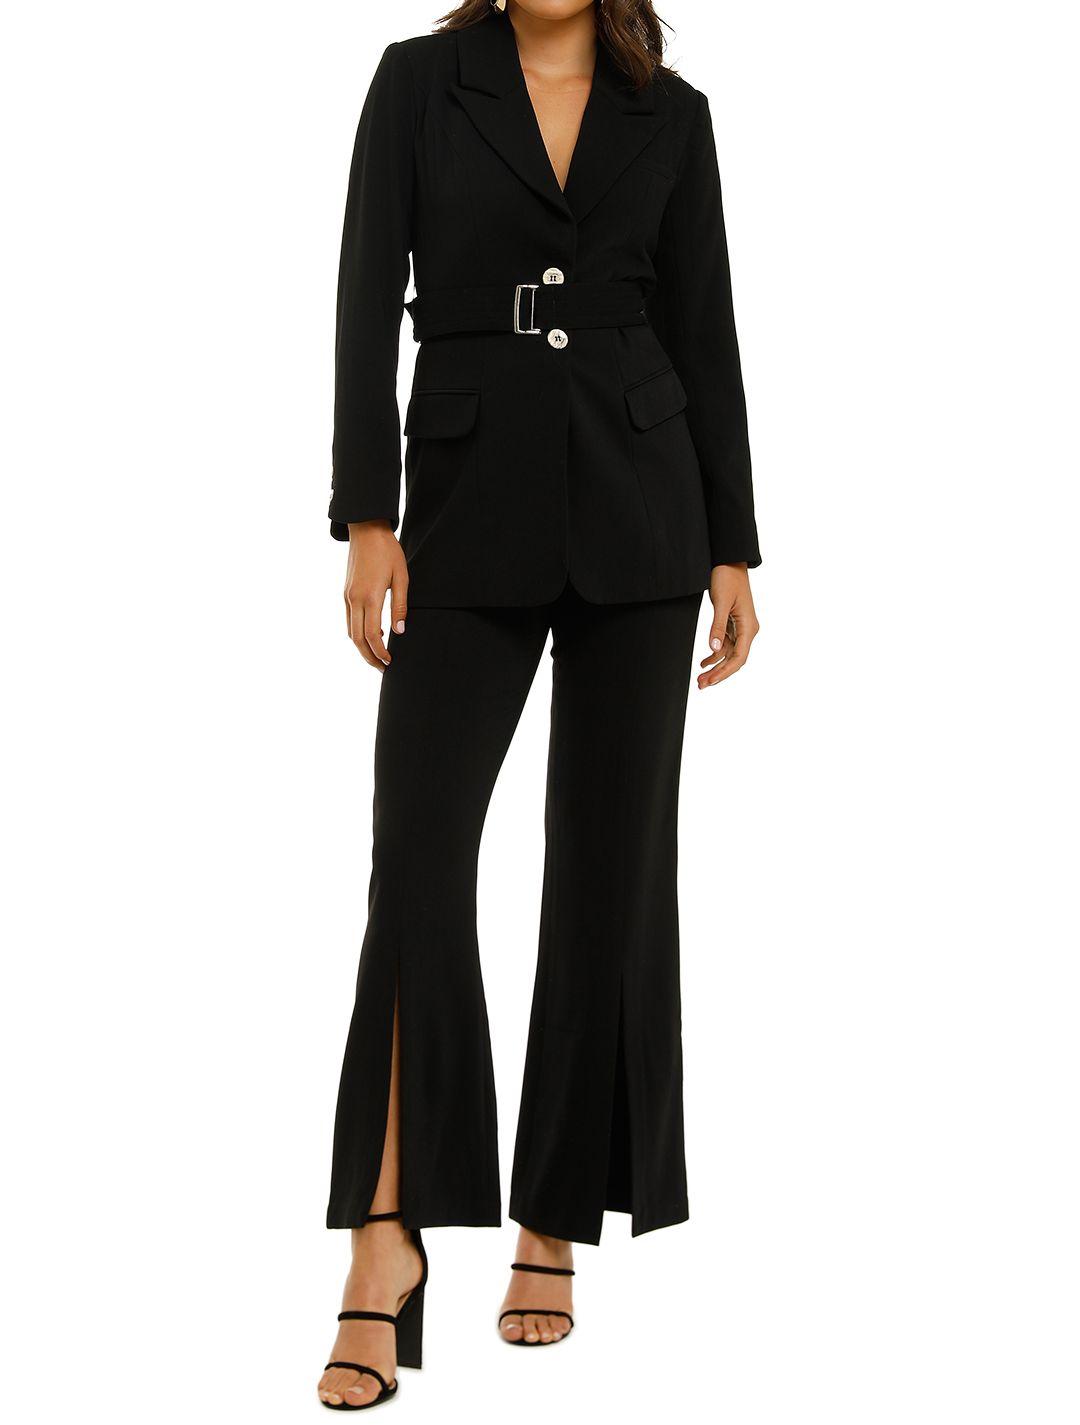 Elliatt-Coppelia-Blazer-and-Pant-Set-Black-Front